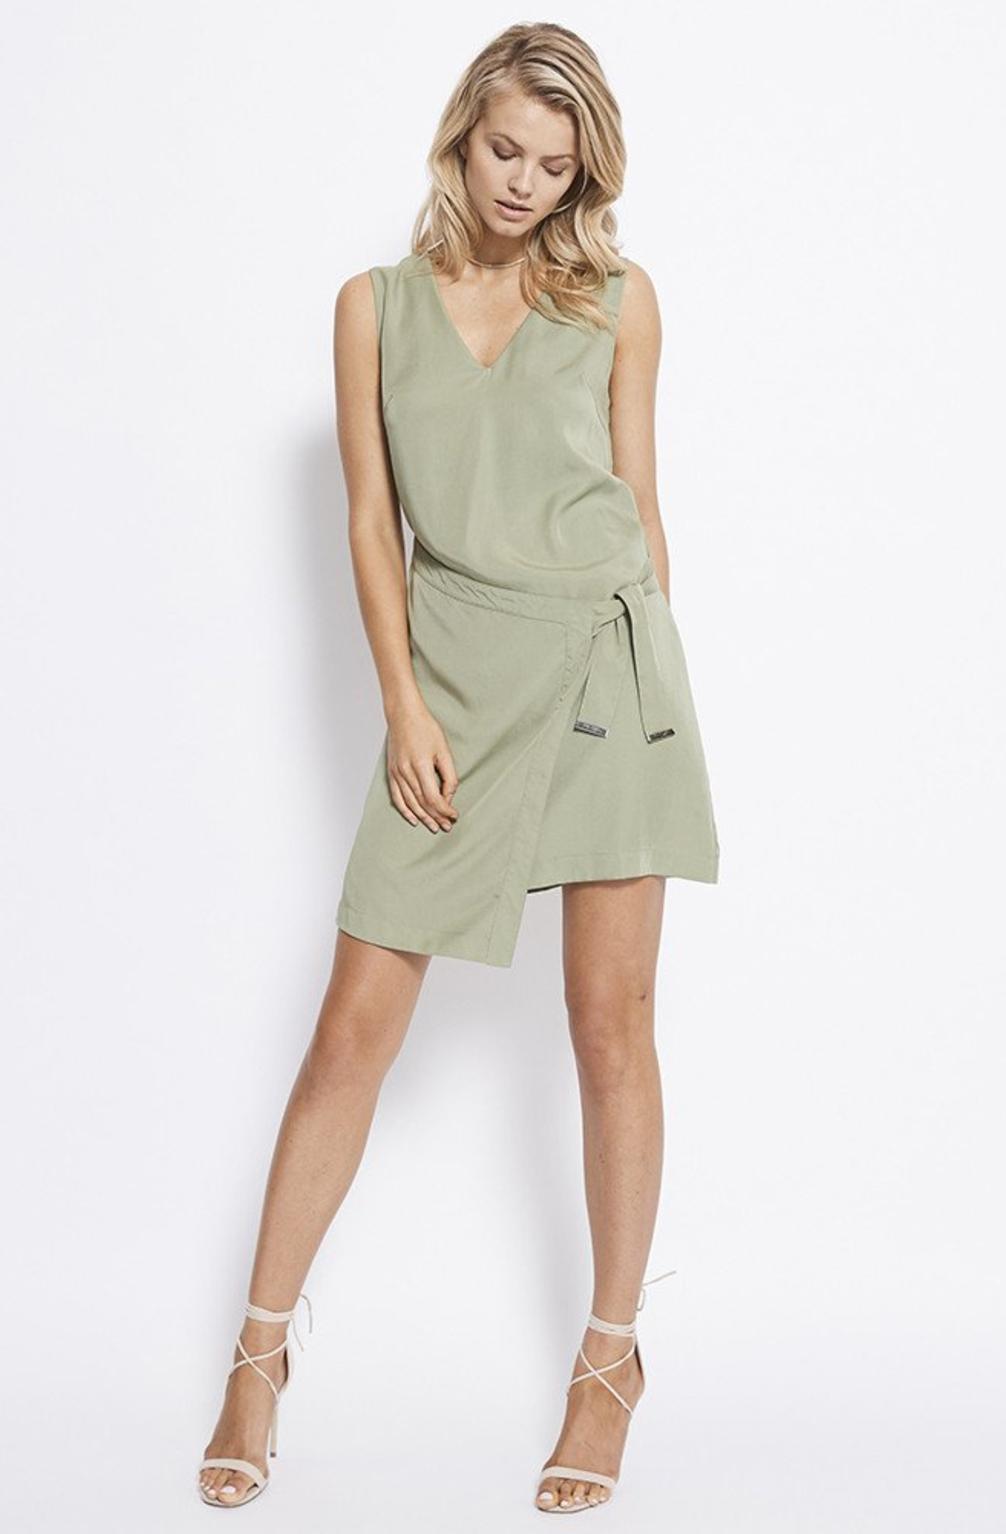 Staple the Label Steph dress $109.95